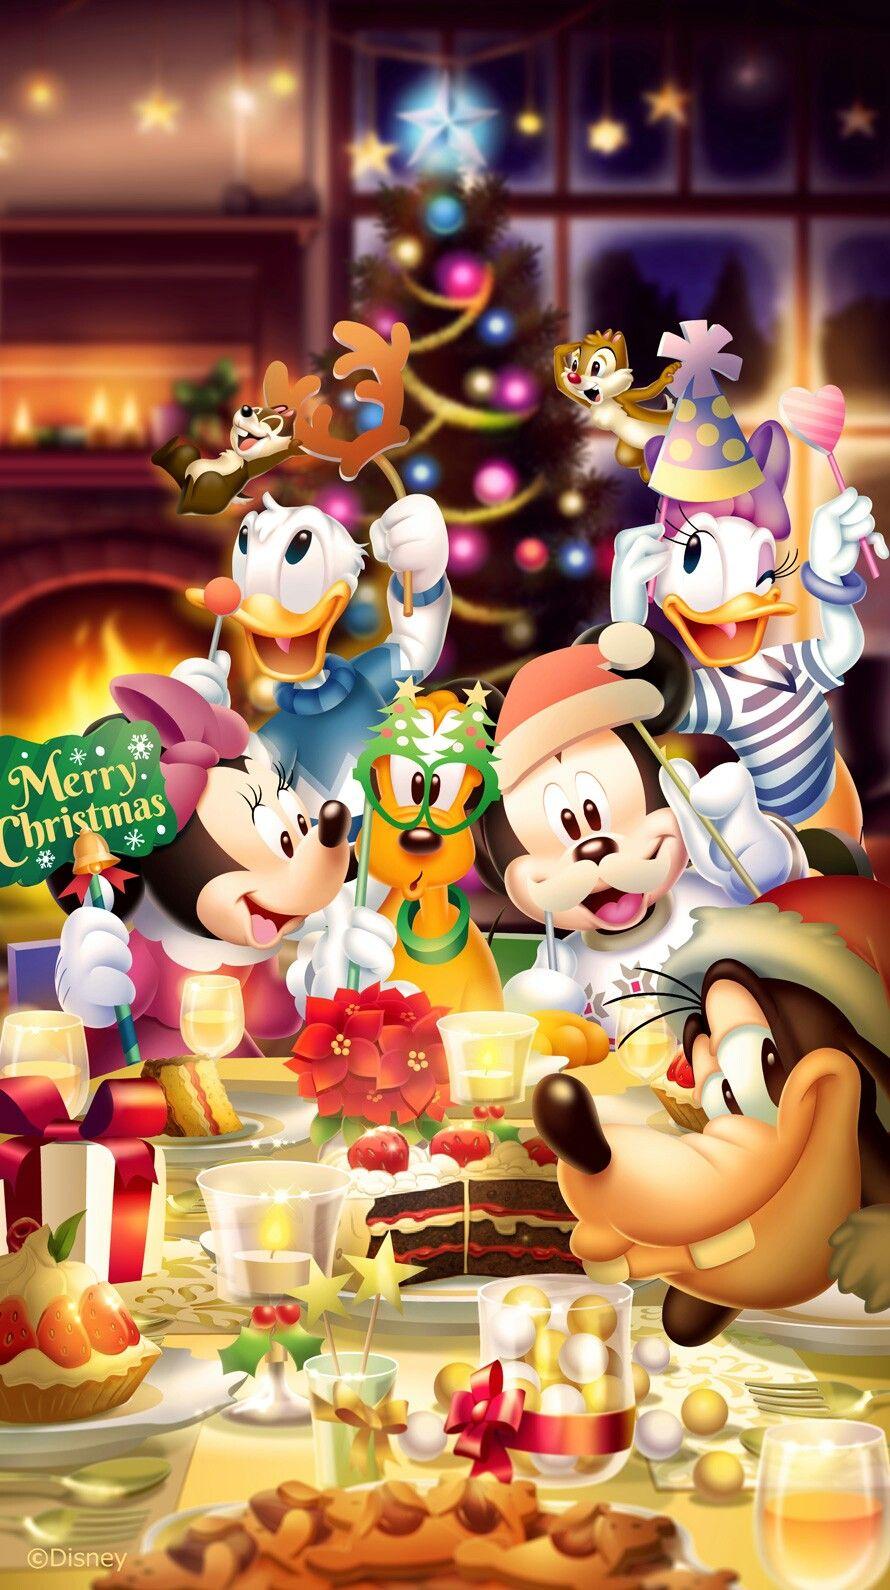 Disney Merry Xmas Wallpaper Iphone Christmas Mickey Mouse Christmas Mickey Christmas